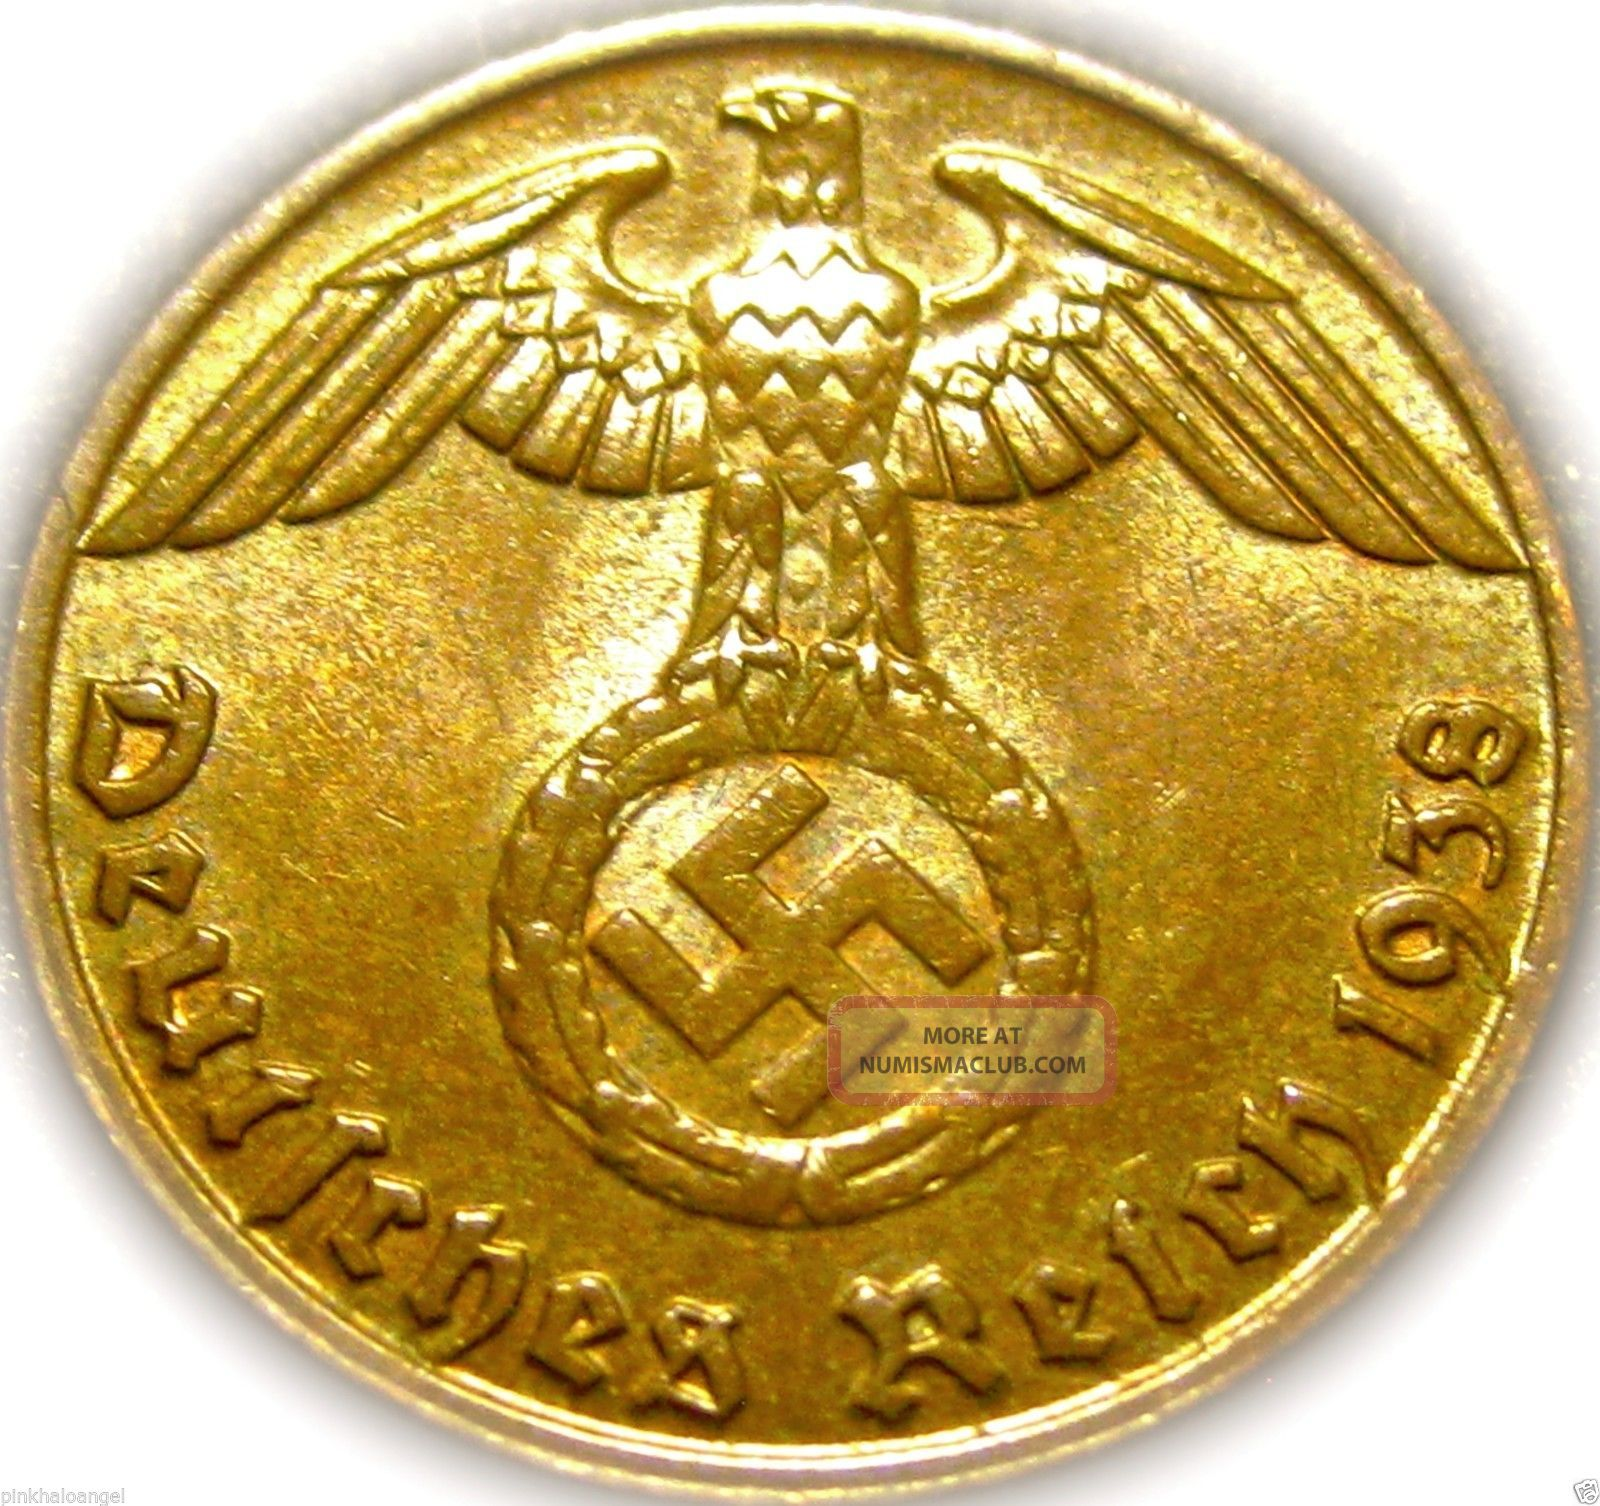 ♡ Germany - German Third Reich 1938j Reichspfennig W/ Swastika - Ww2 - Rare Coin Germany photo